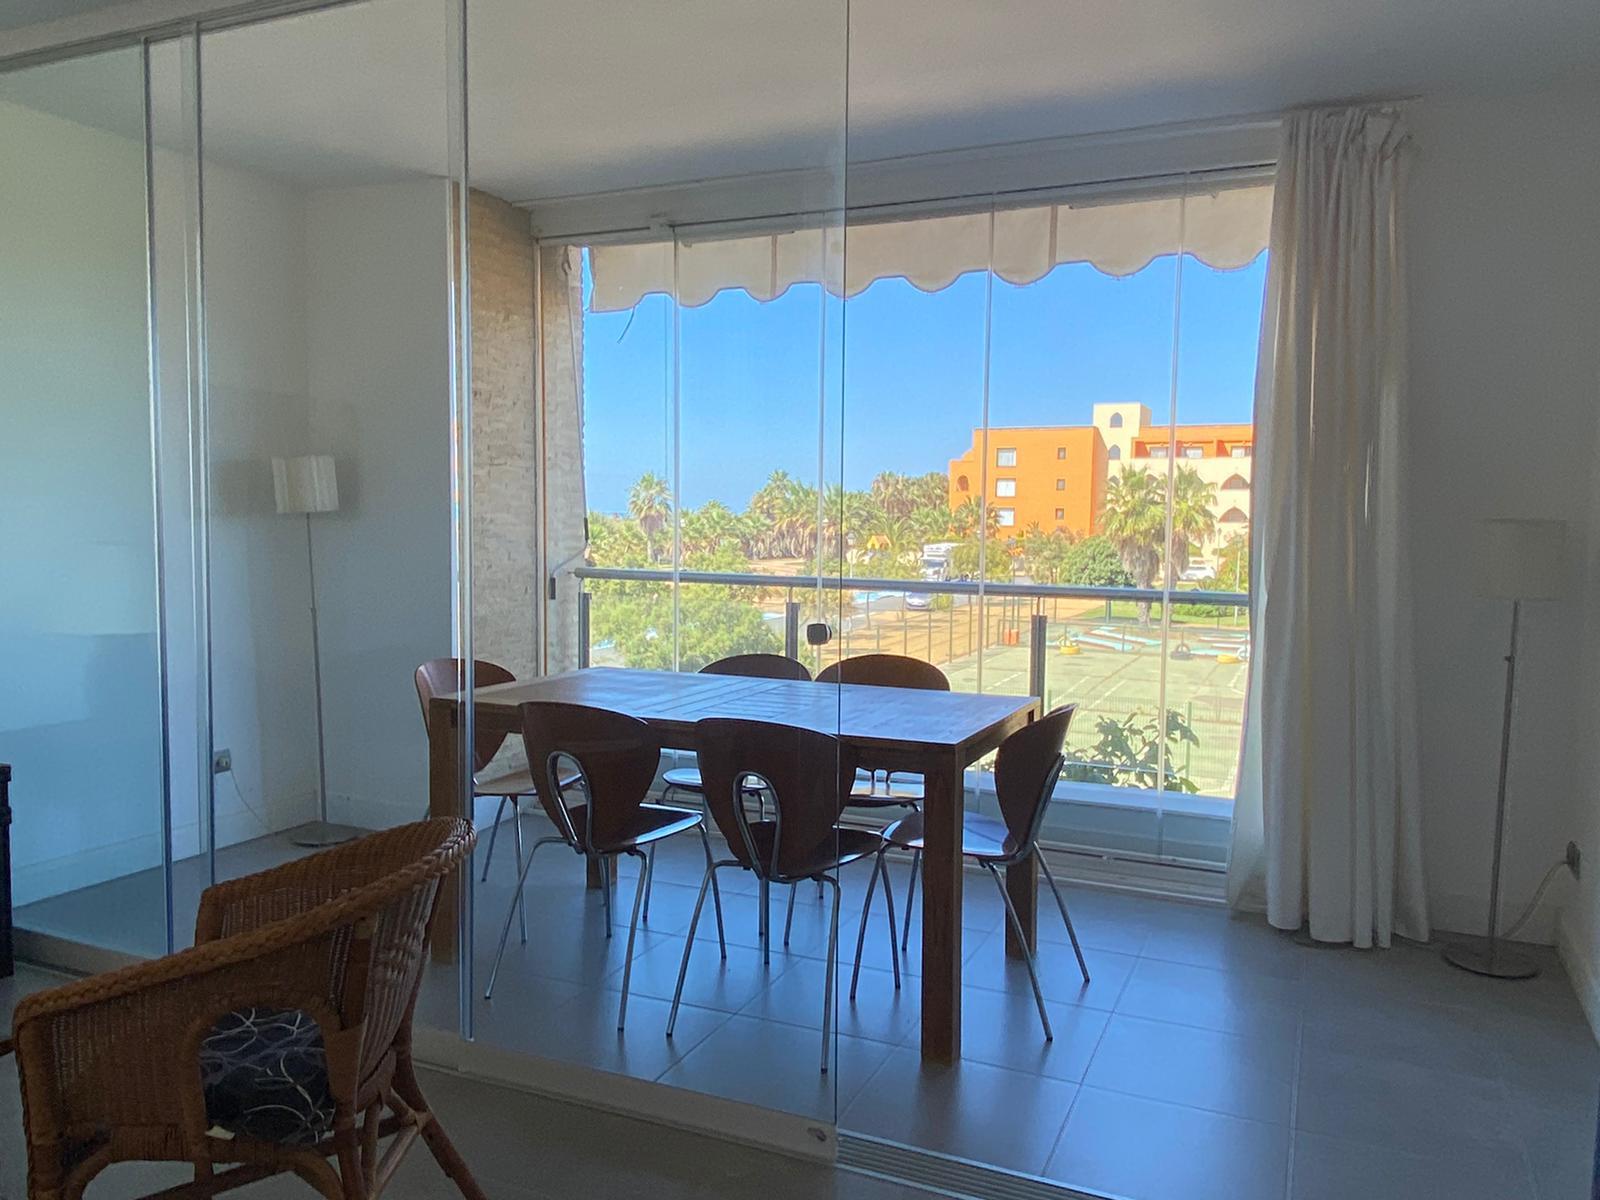 Imagen 13 del Apartamento en El Espigón, 1ª Planta nº4 Poniente (3d+2b), Punta del Moral (HUELVA), Paseo de la Cruz nº22